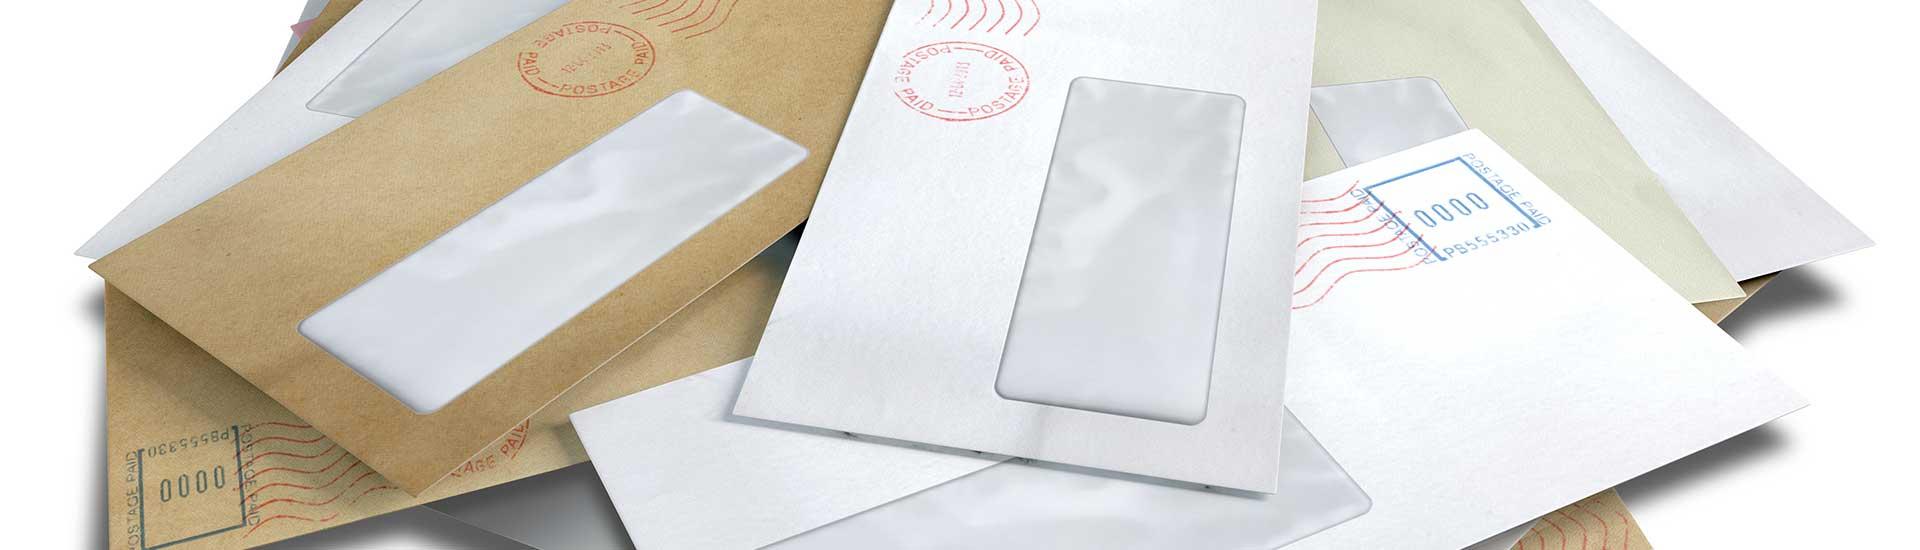 Veilige E-mail Coalitie